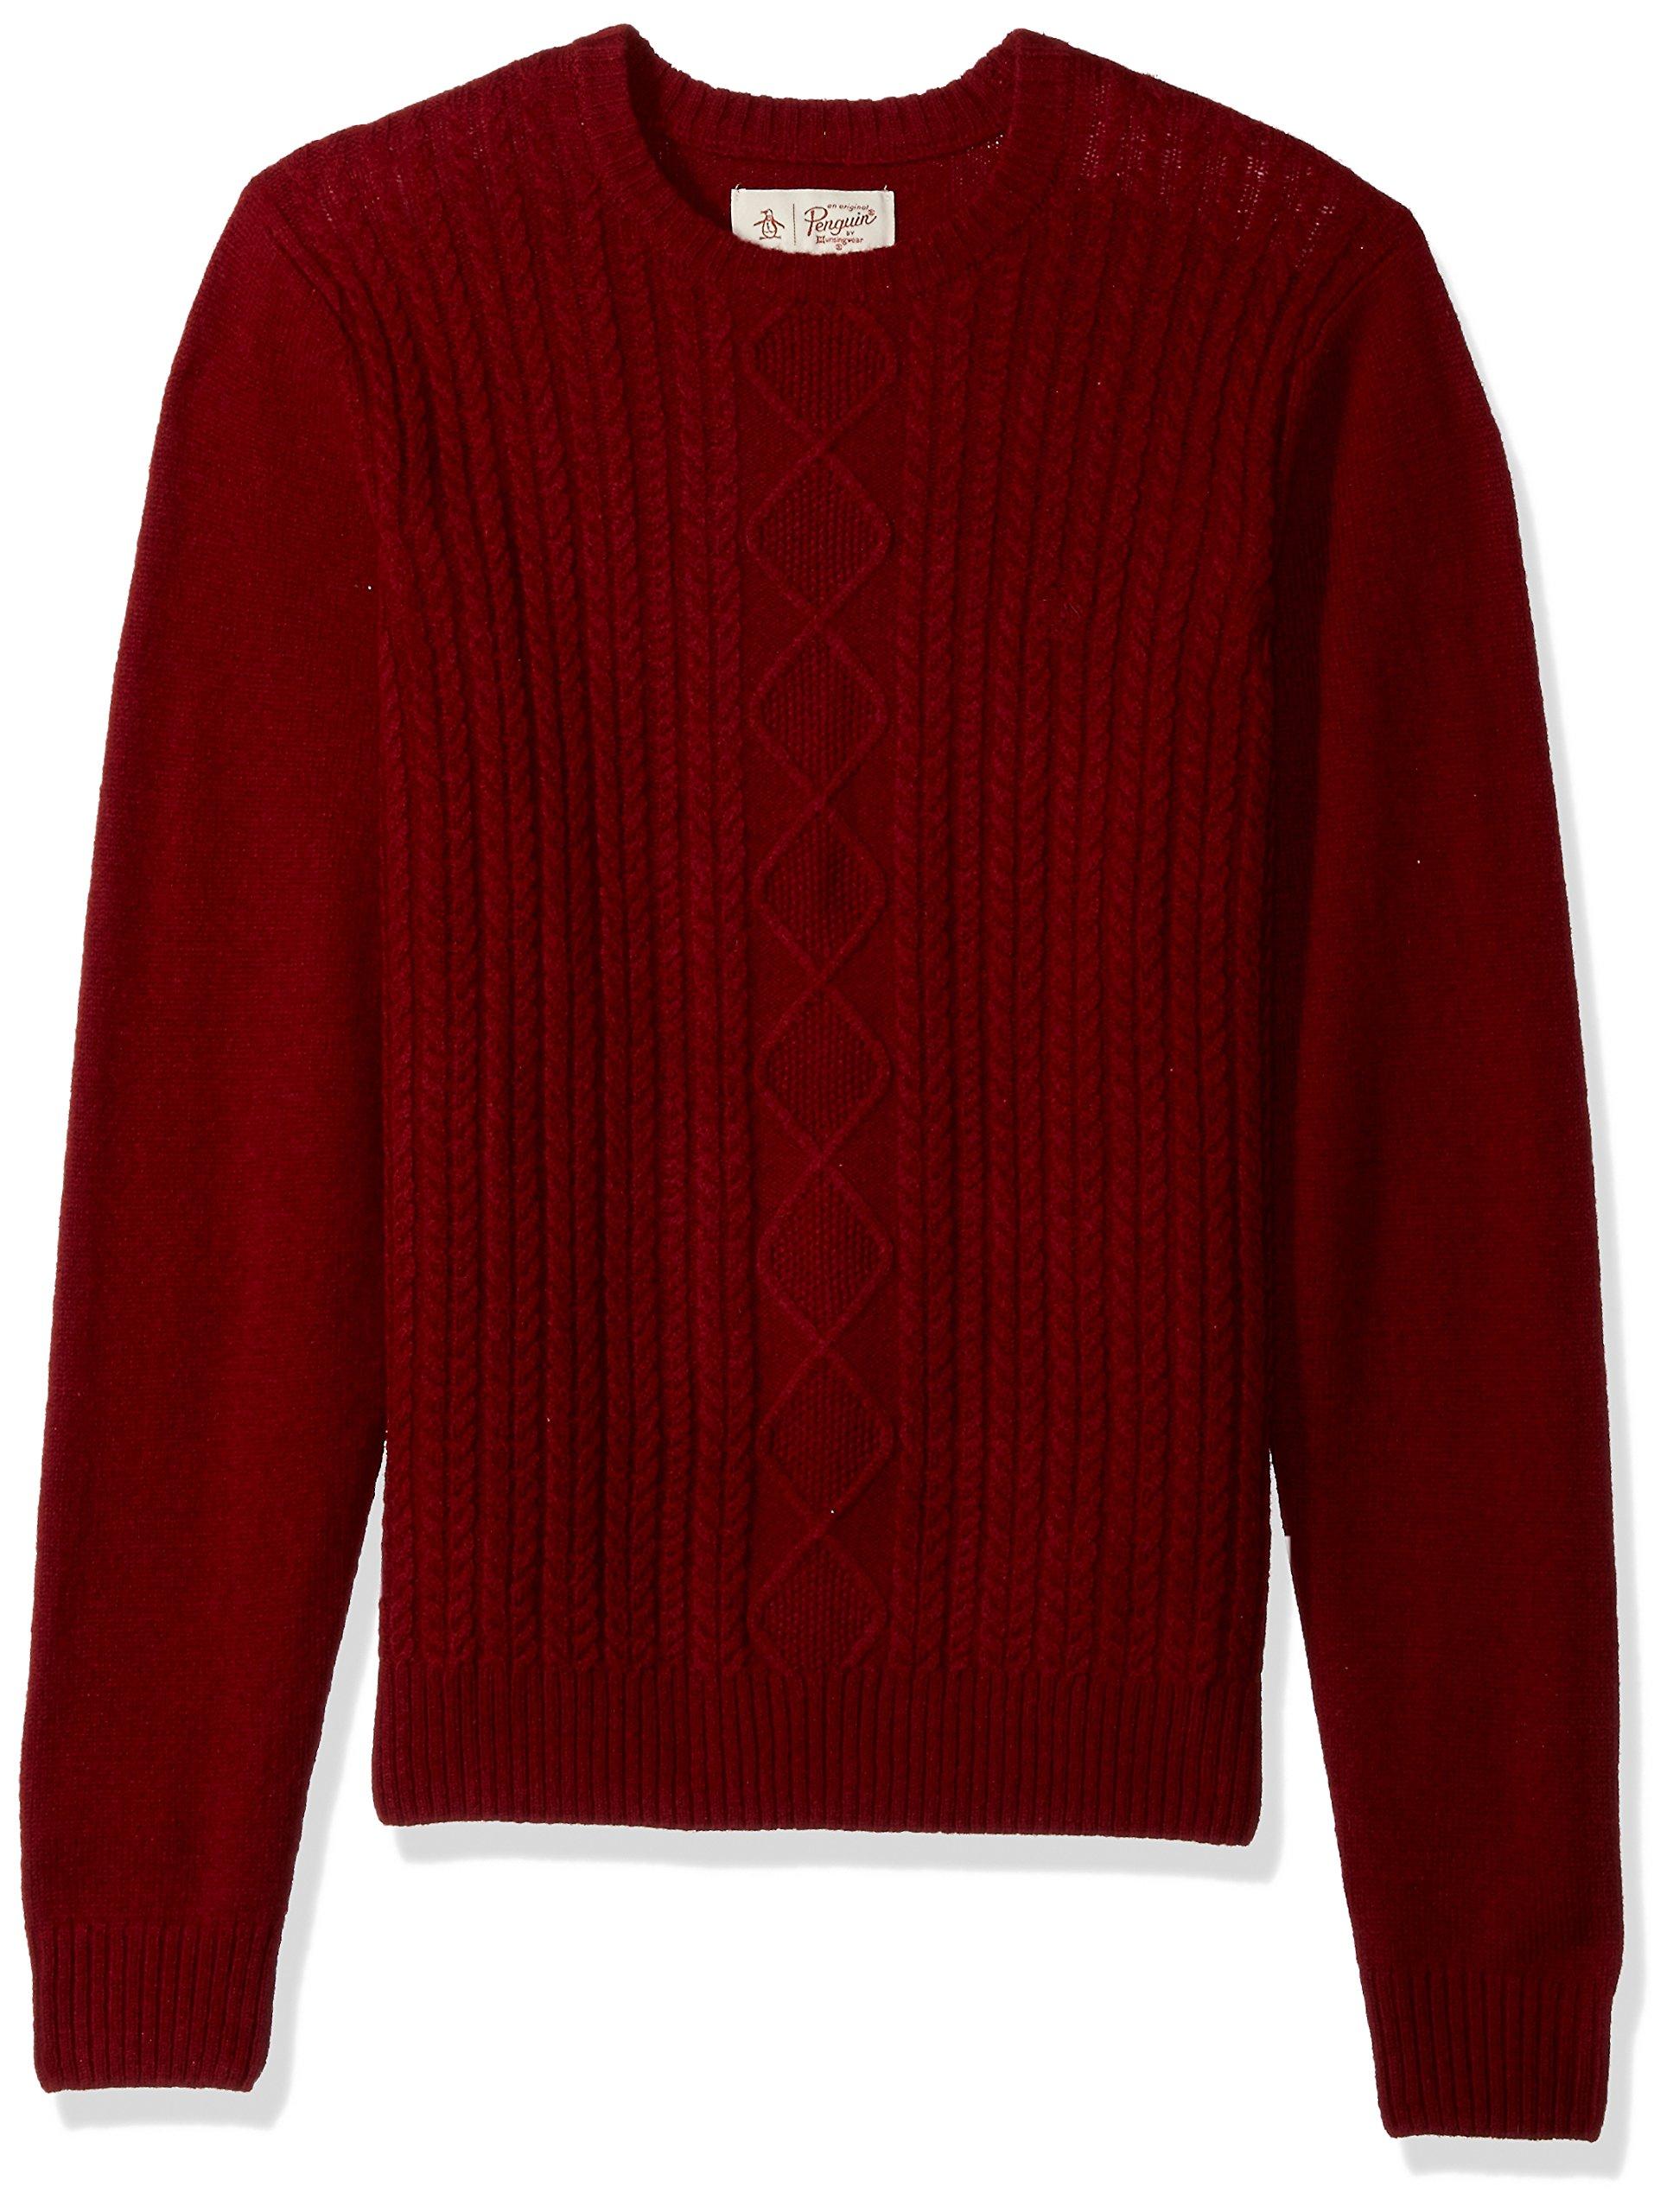 Original Penguin Men's Fisherman's Cable Crew Sweater, Pomegranate, Large